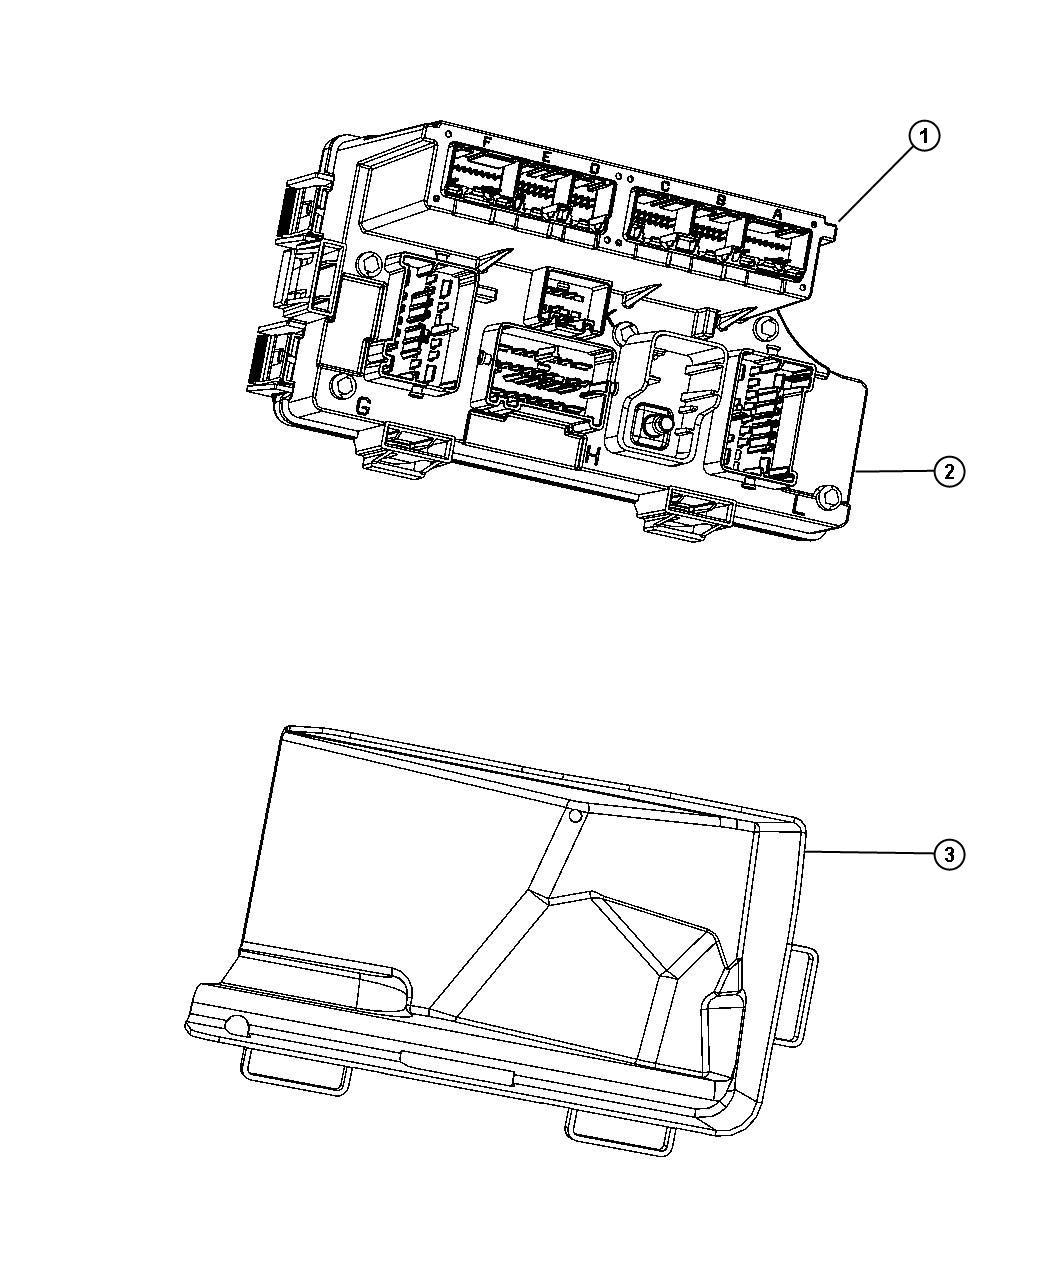 Dodge Avenger Fuse. Mini. 30 amp, green. Export, mexico